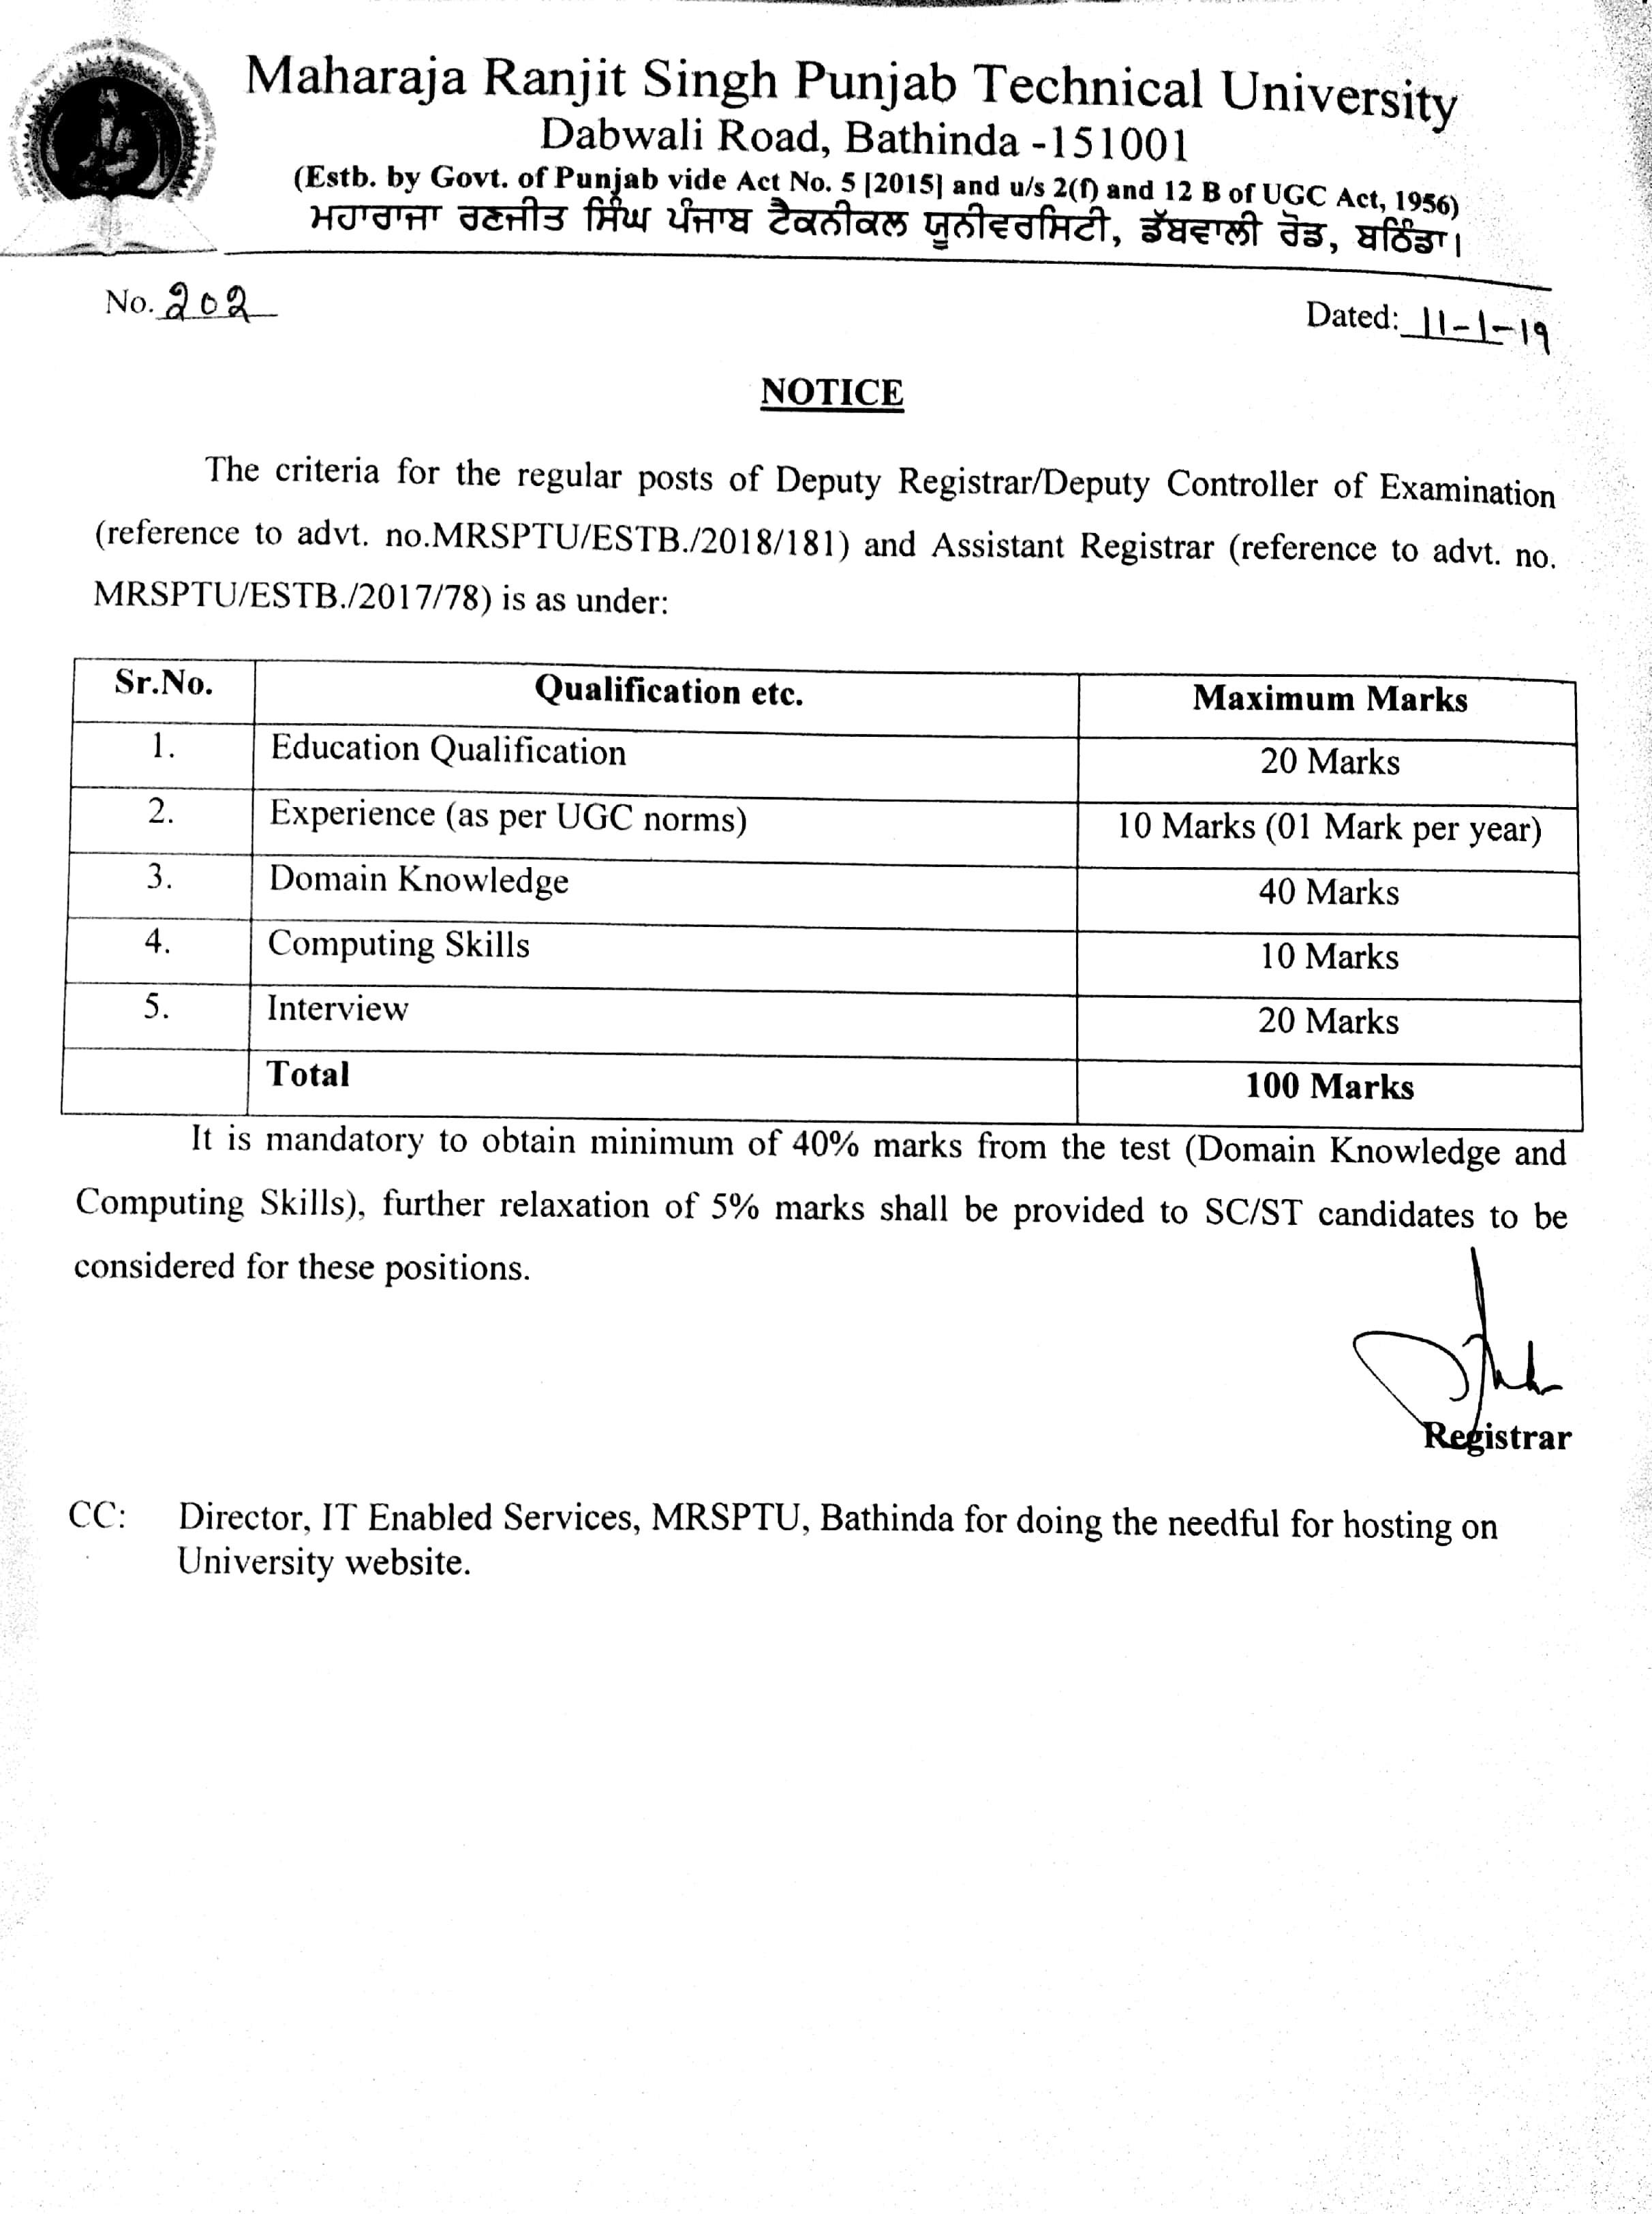 Nanakshahi Calendar March 2019 Más Arriba-a-fecha Maharaja Ranjit Singh Punjab Technical University Of Nanakshahi Calendar March 2019 Más Recientes School Year Calendars School Year Calendars